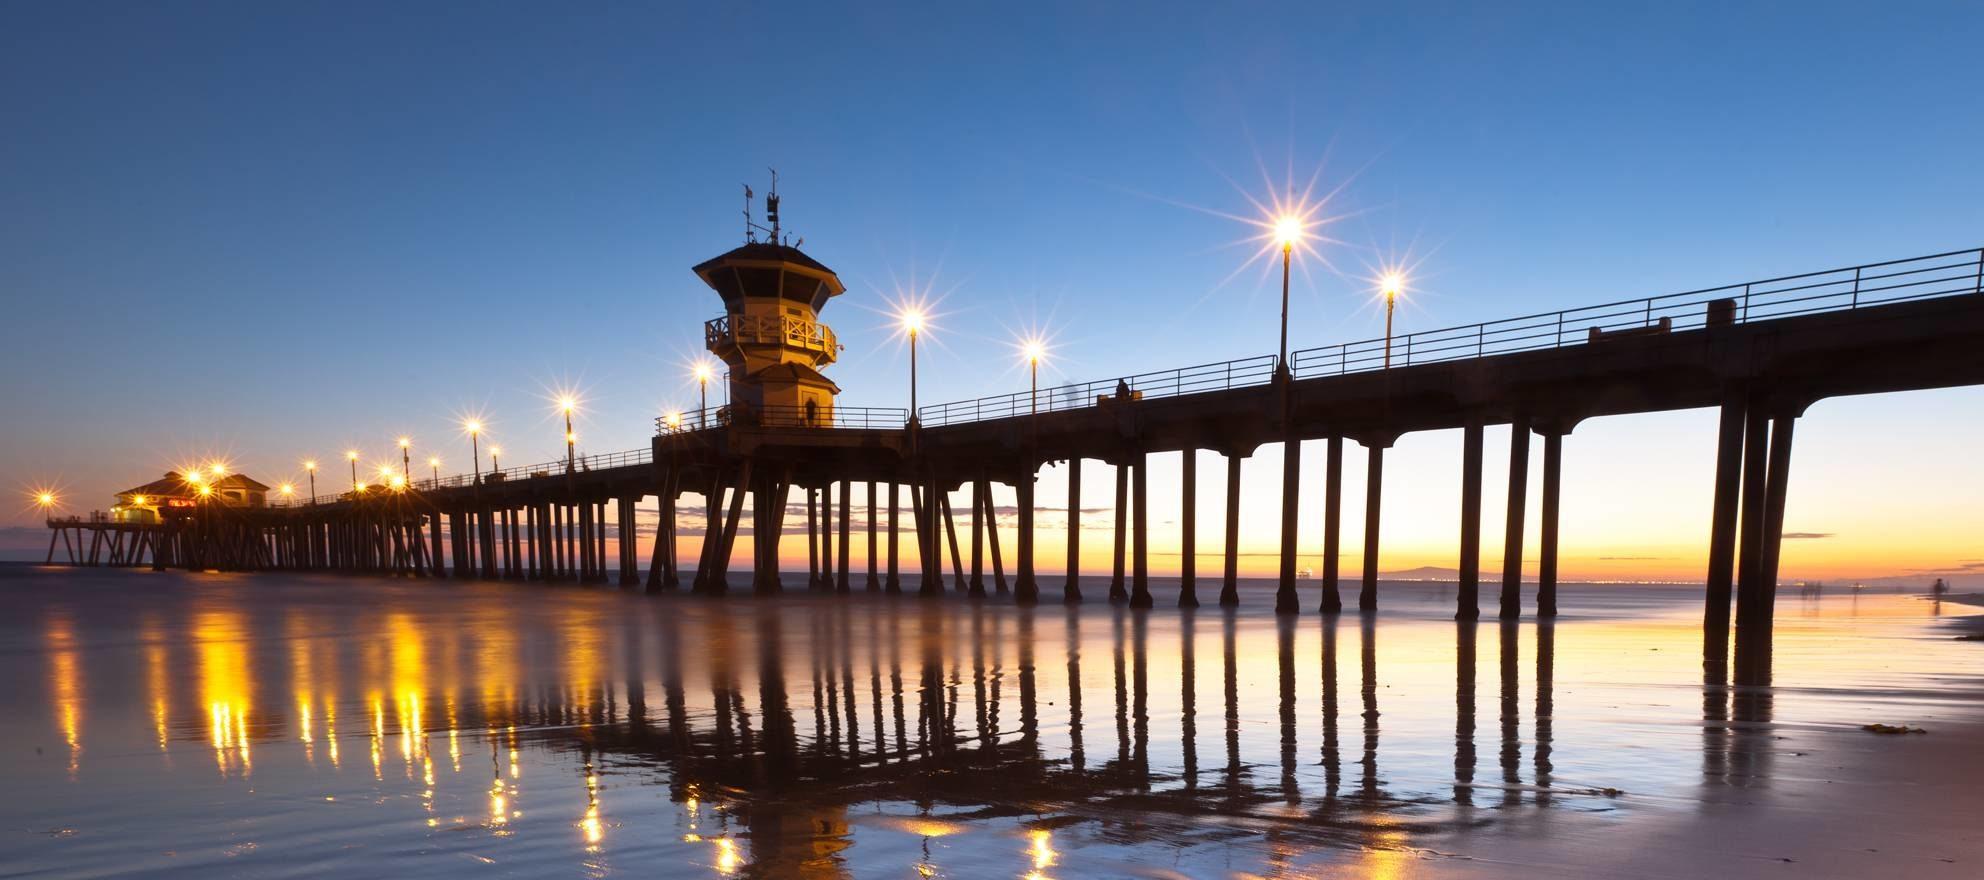 California pending sales hit 6-year high